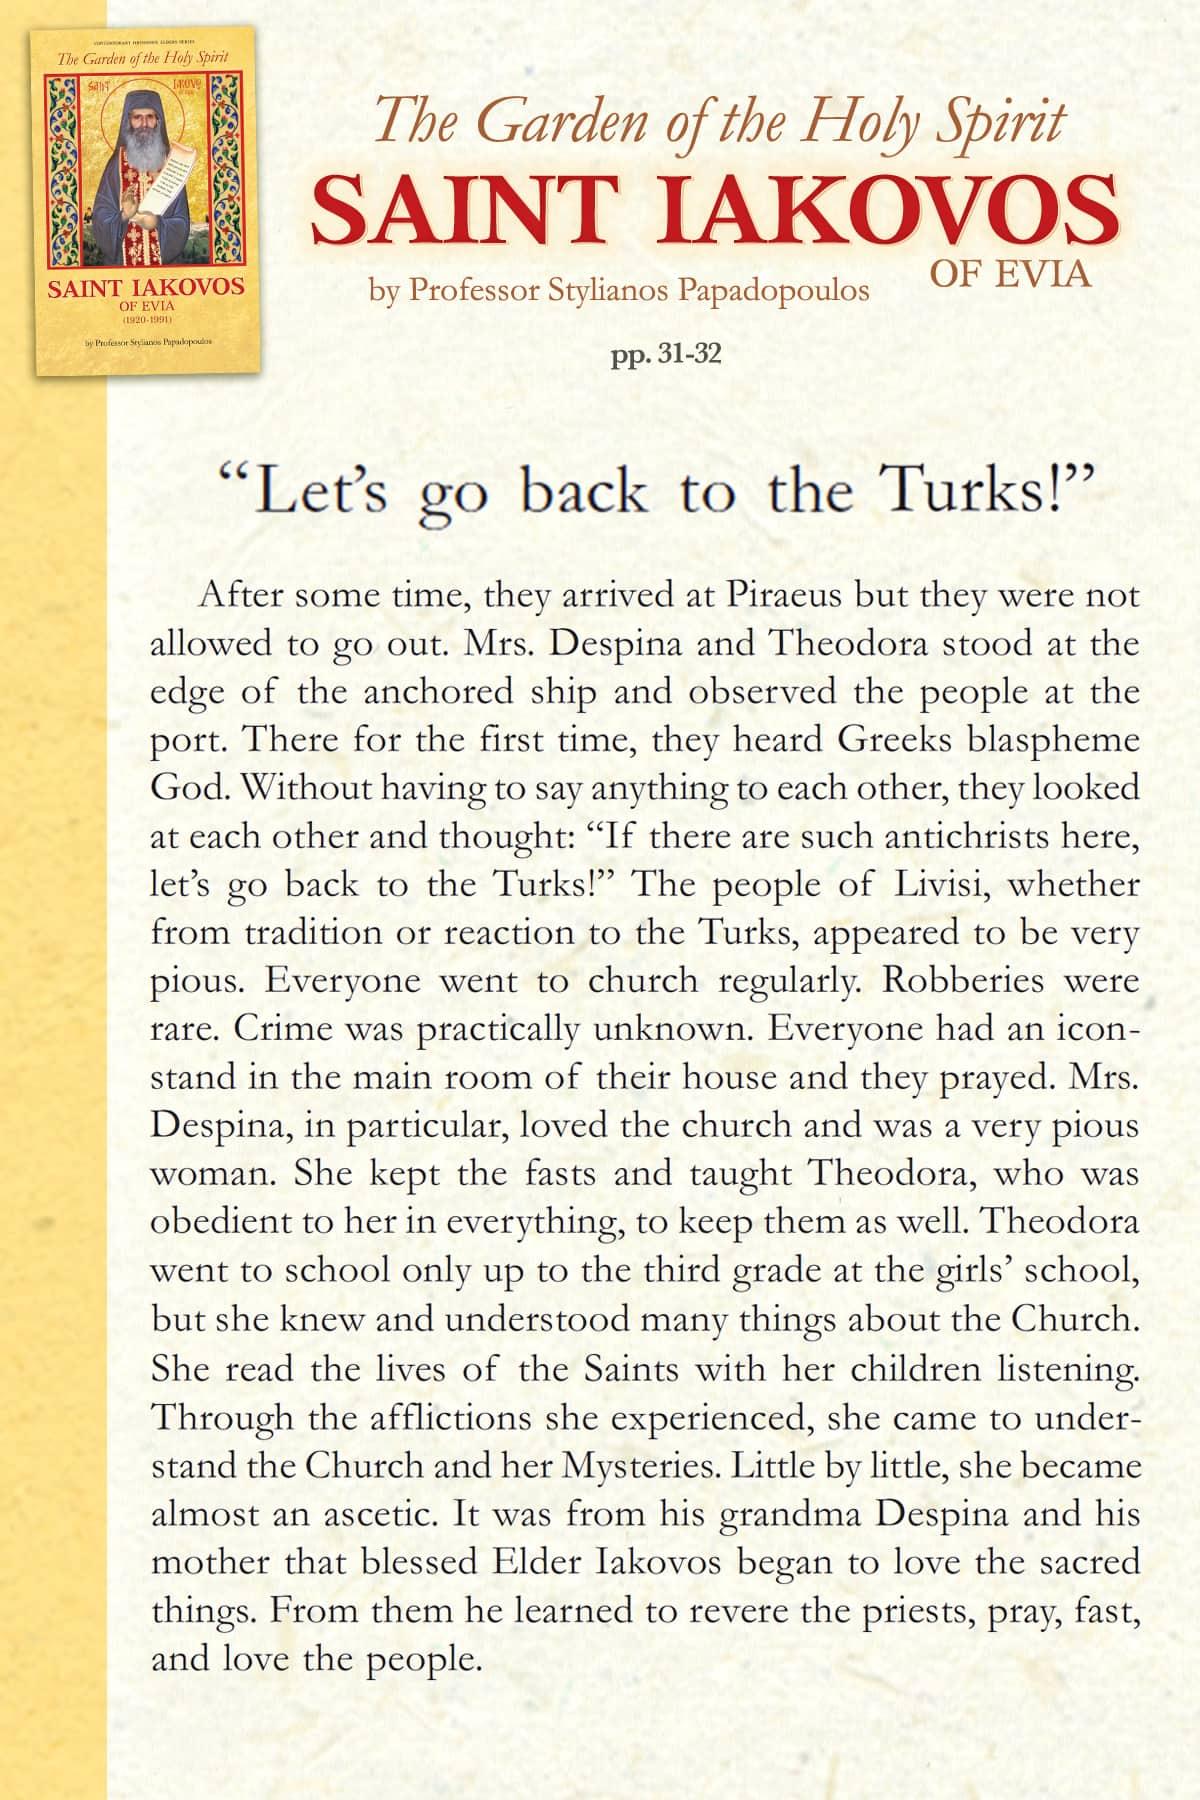 Saint-Iakovos-lets-go-back-to-the-turks